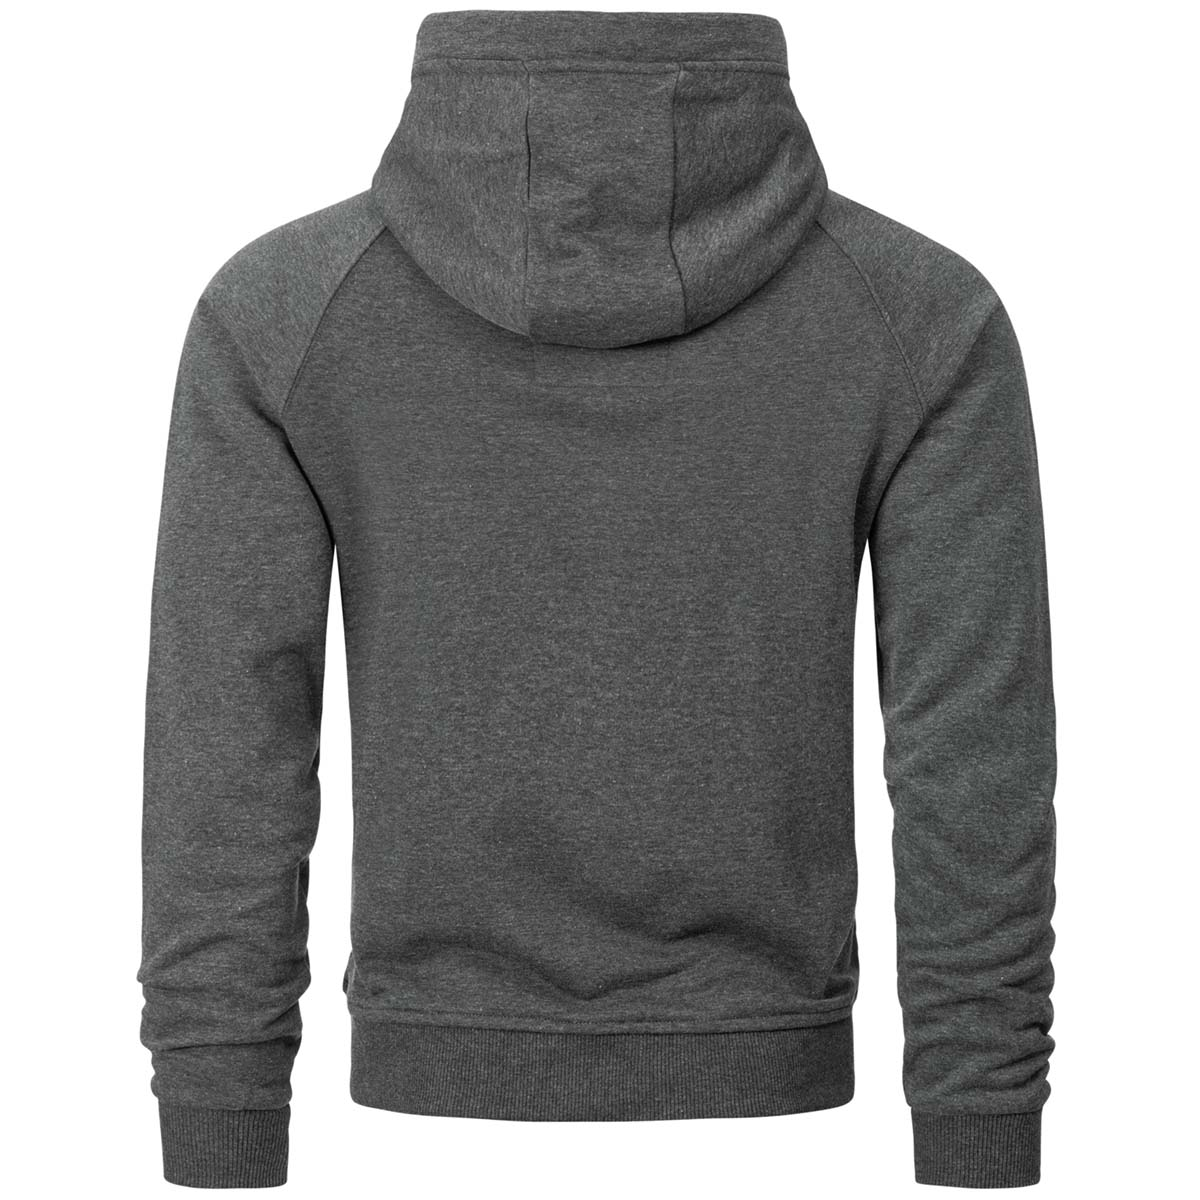 A-Salvarini-Herren-Sweatjacke-Kapuzenpullover-Jacke-Kapuze-Hoodie-Sweater-AS192 Indexbild 19